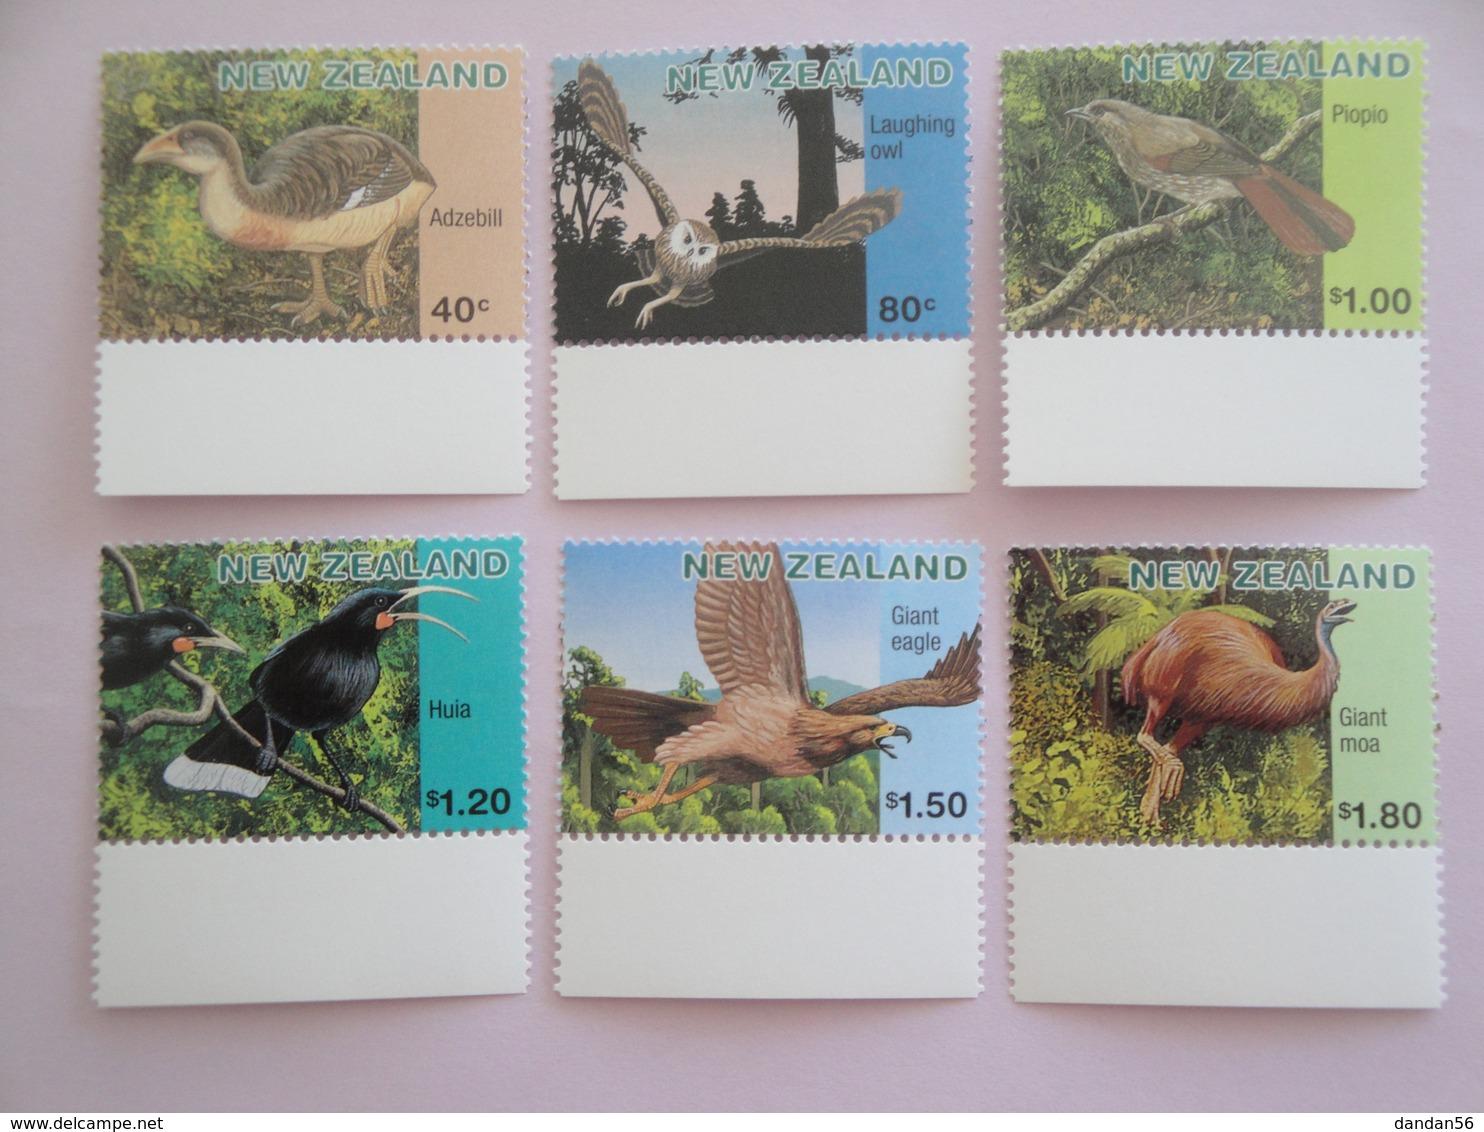 1996 Nouvelle Zélande Oiseaux Birds Yvert 1482/7 ** Scott 1393/8 Michel 1558/63 SG 2028/32 - Oiseaux